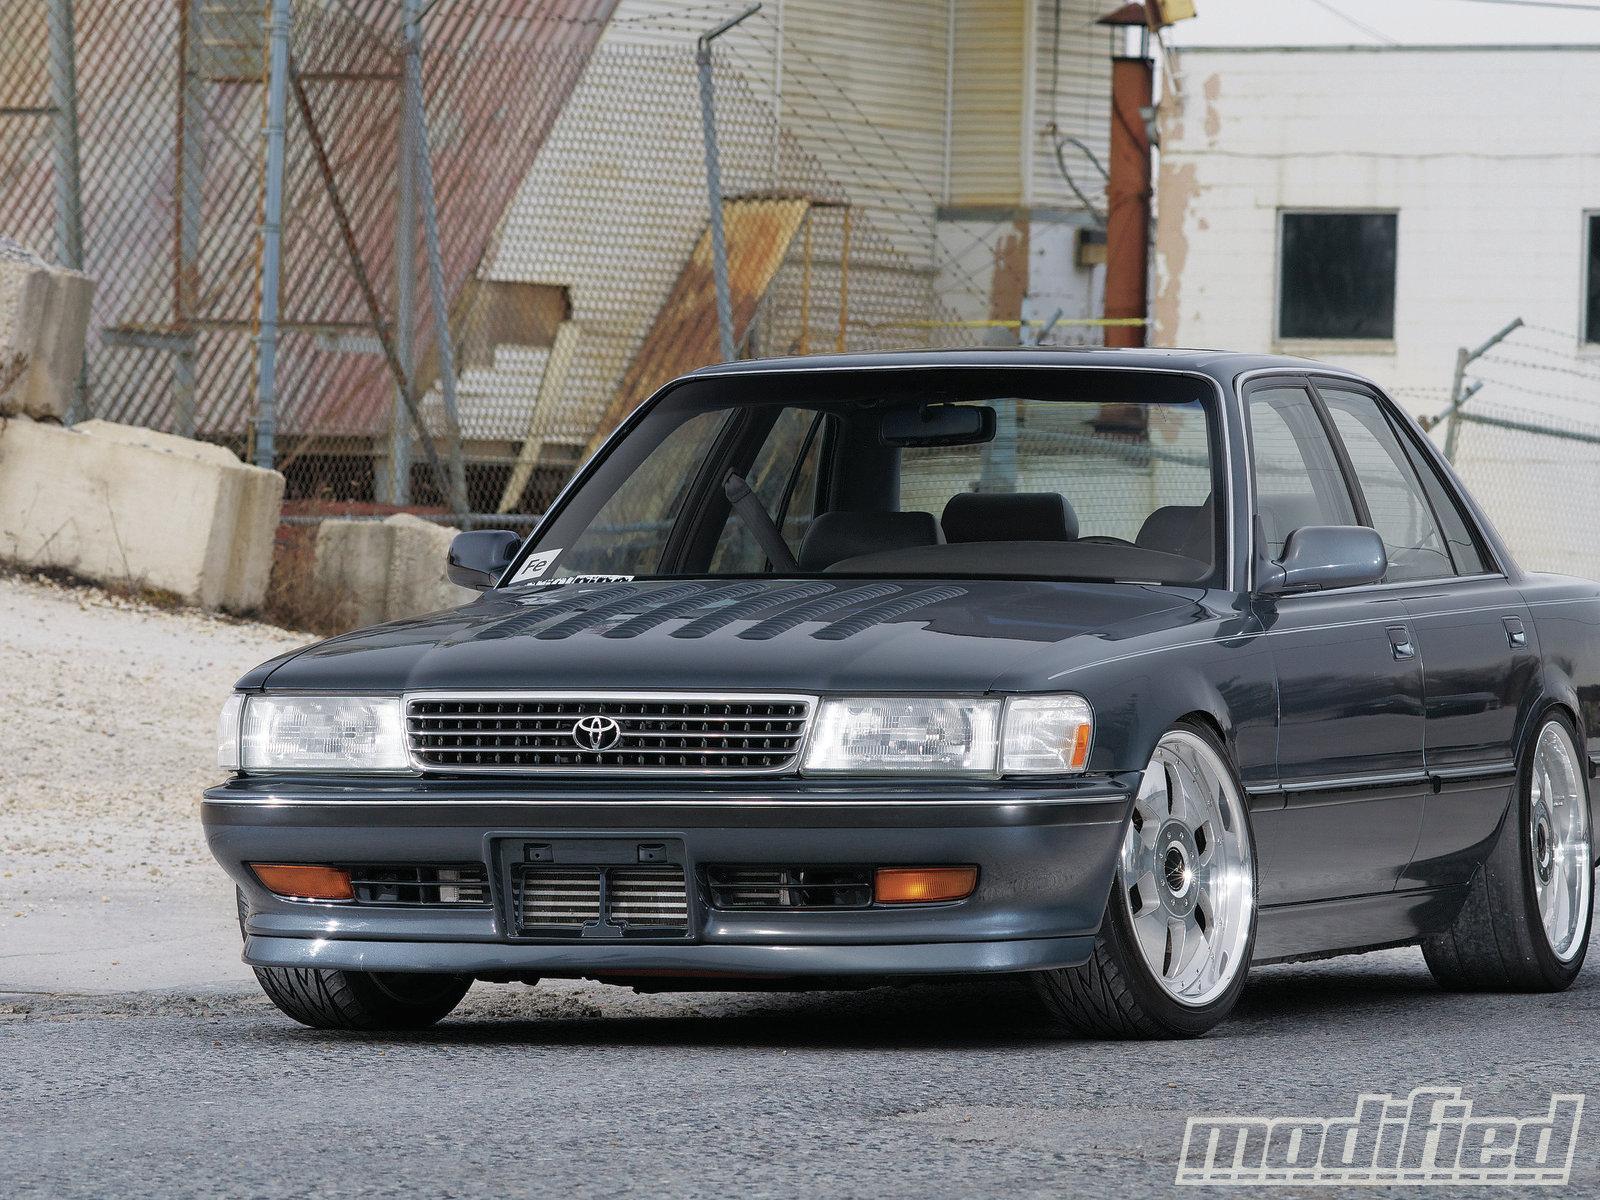 Car For Sale Near Me >> 1988 Toyota Cressida For Sale | Upcomingcarshq.com